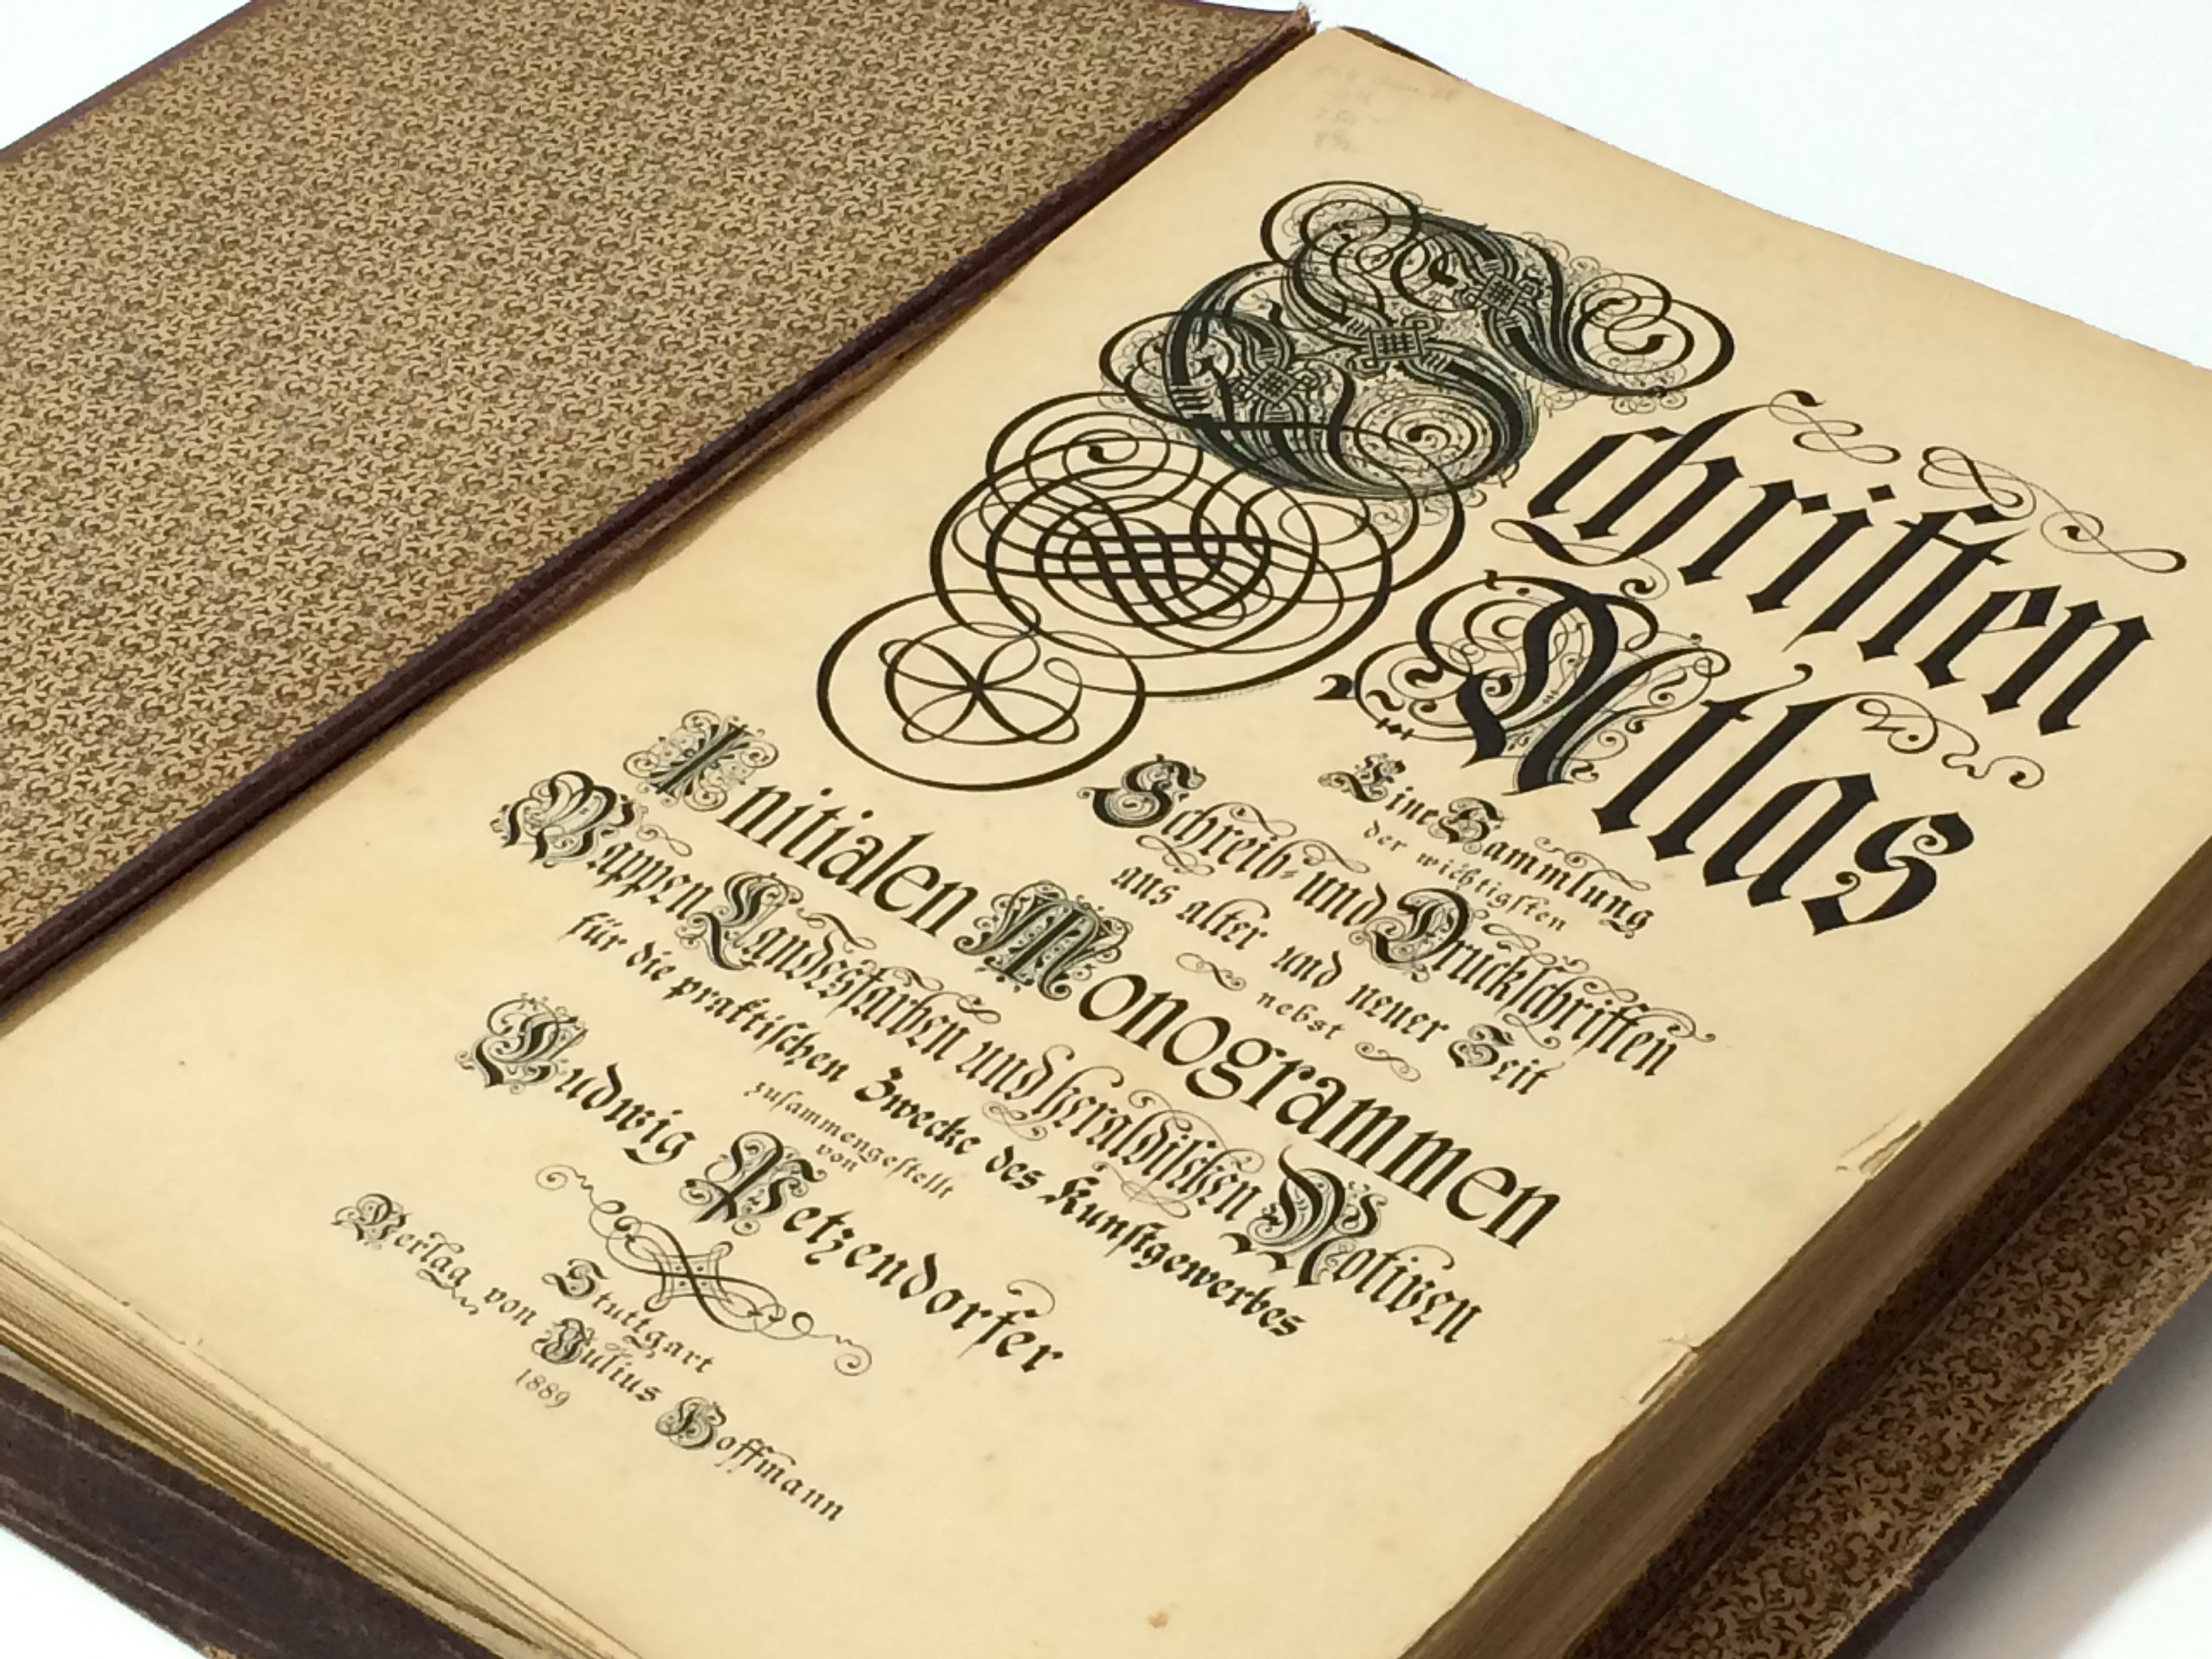 Catálogo tipográfico antiguo de 1889